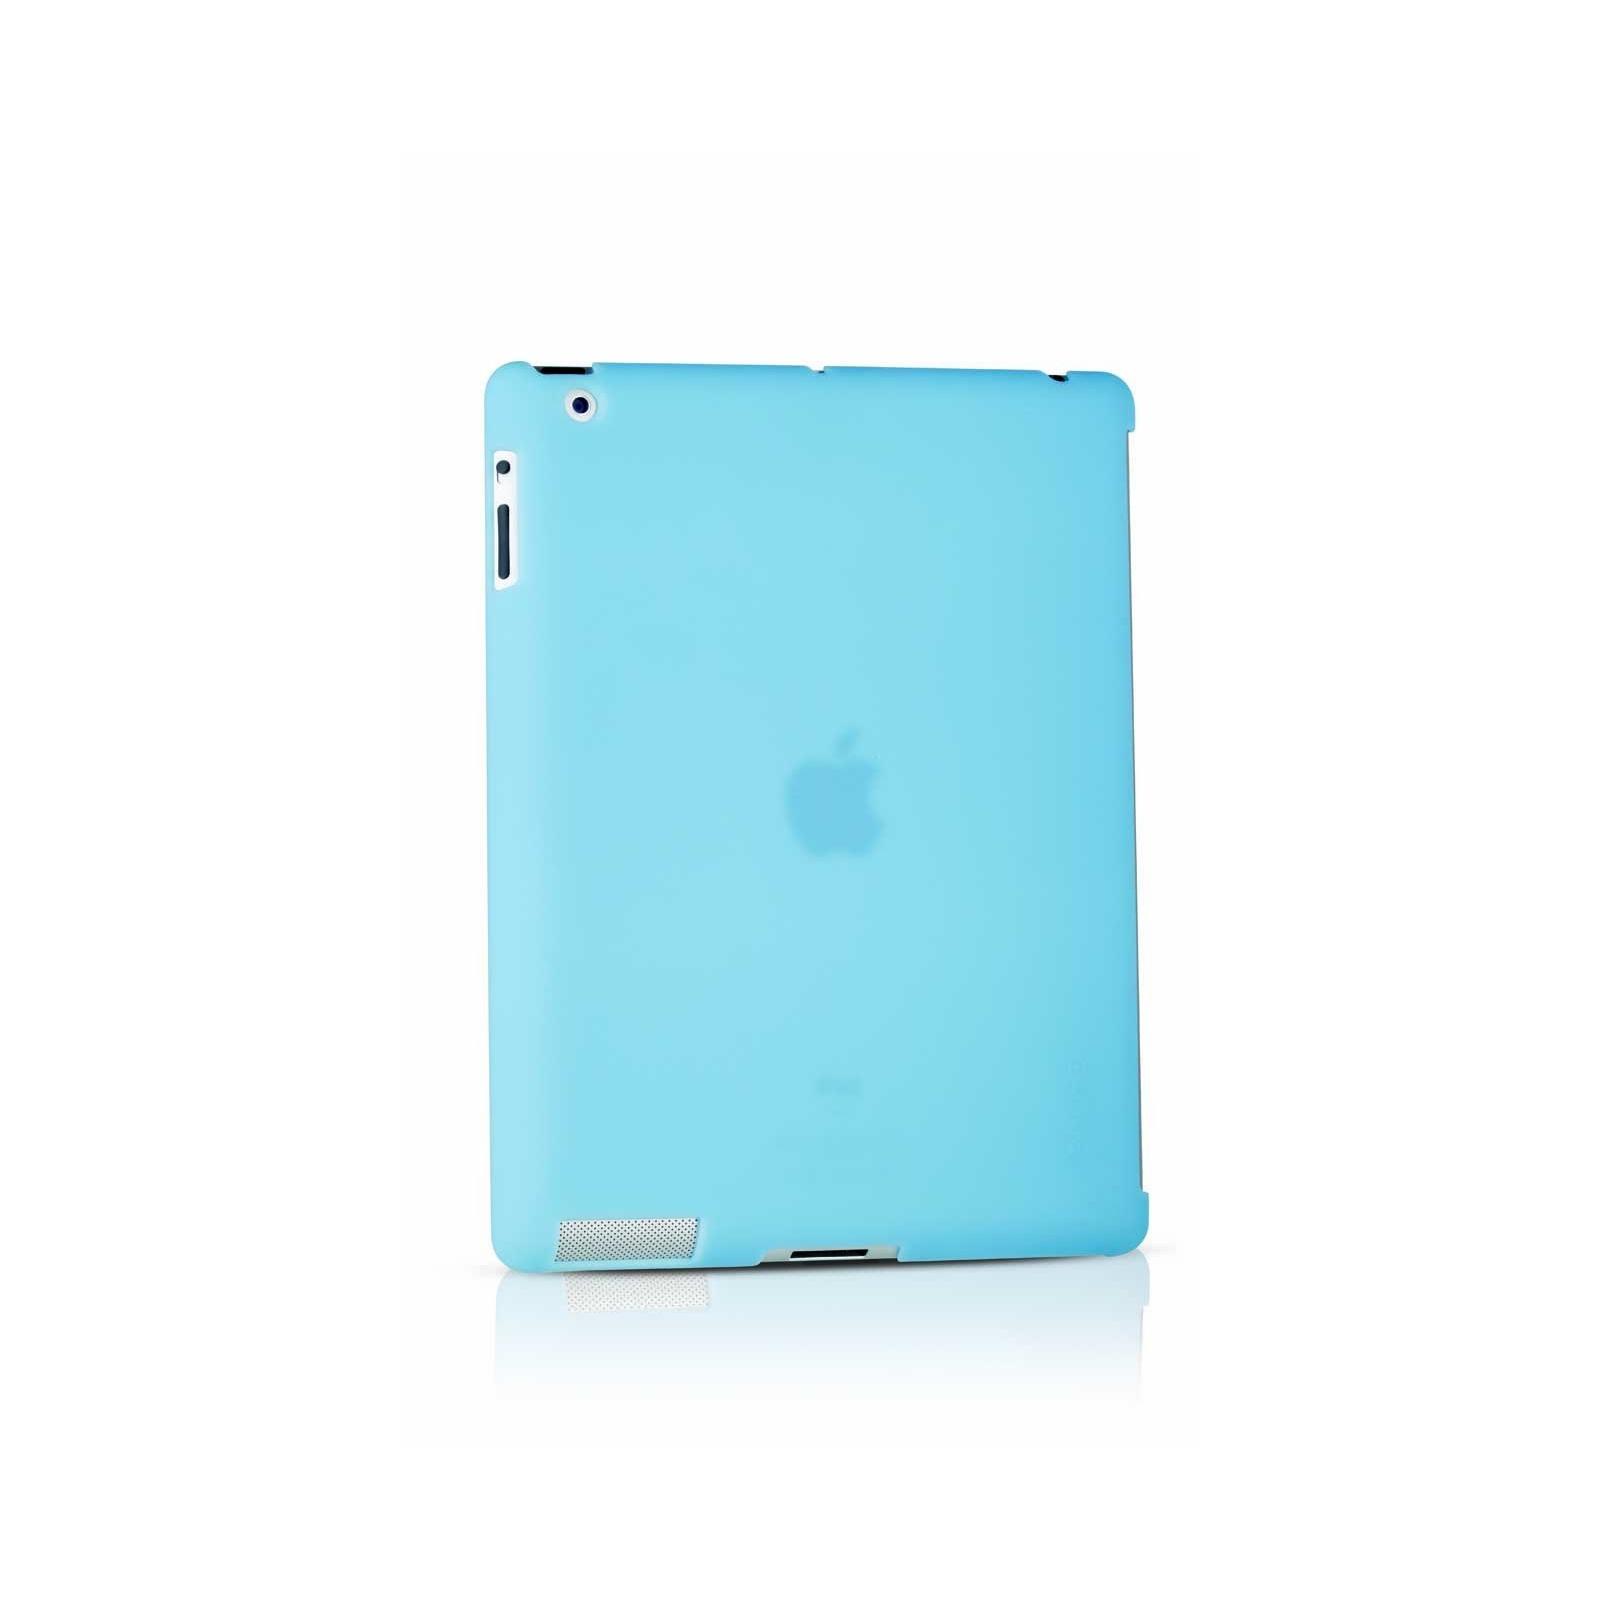 Чехол для планшета ODOYO IPAD AIR /SMARTCOAT BLUE (PA531BL)